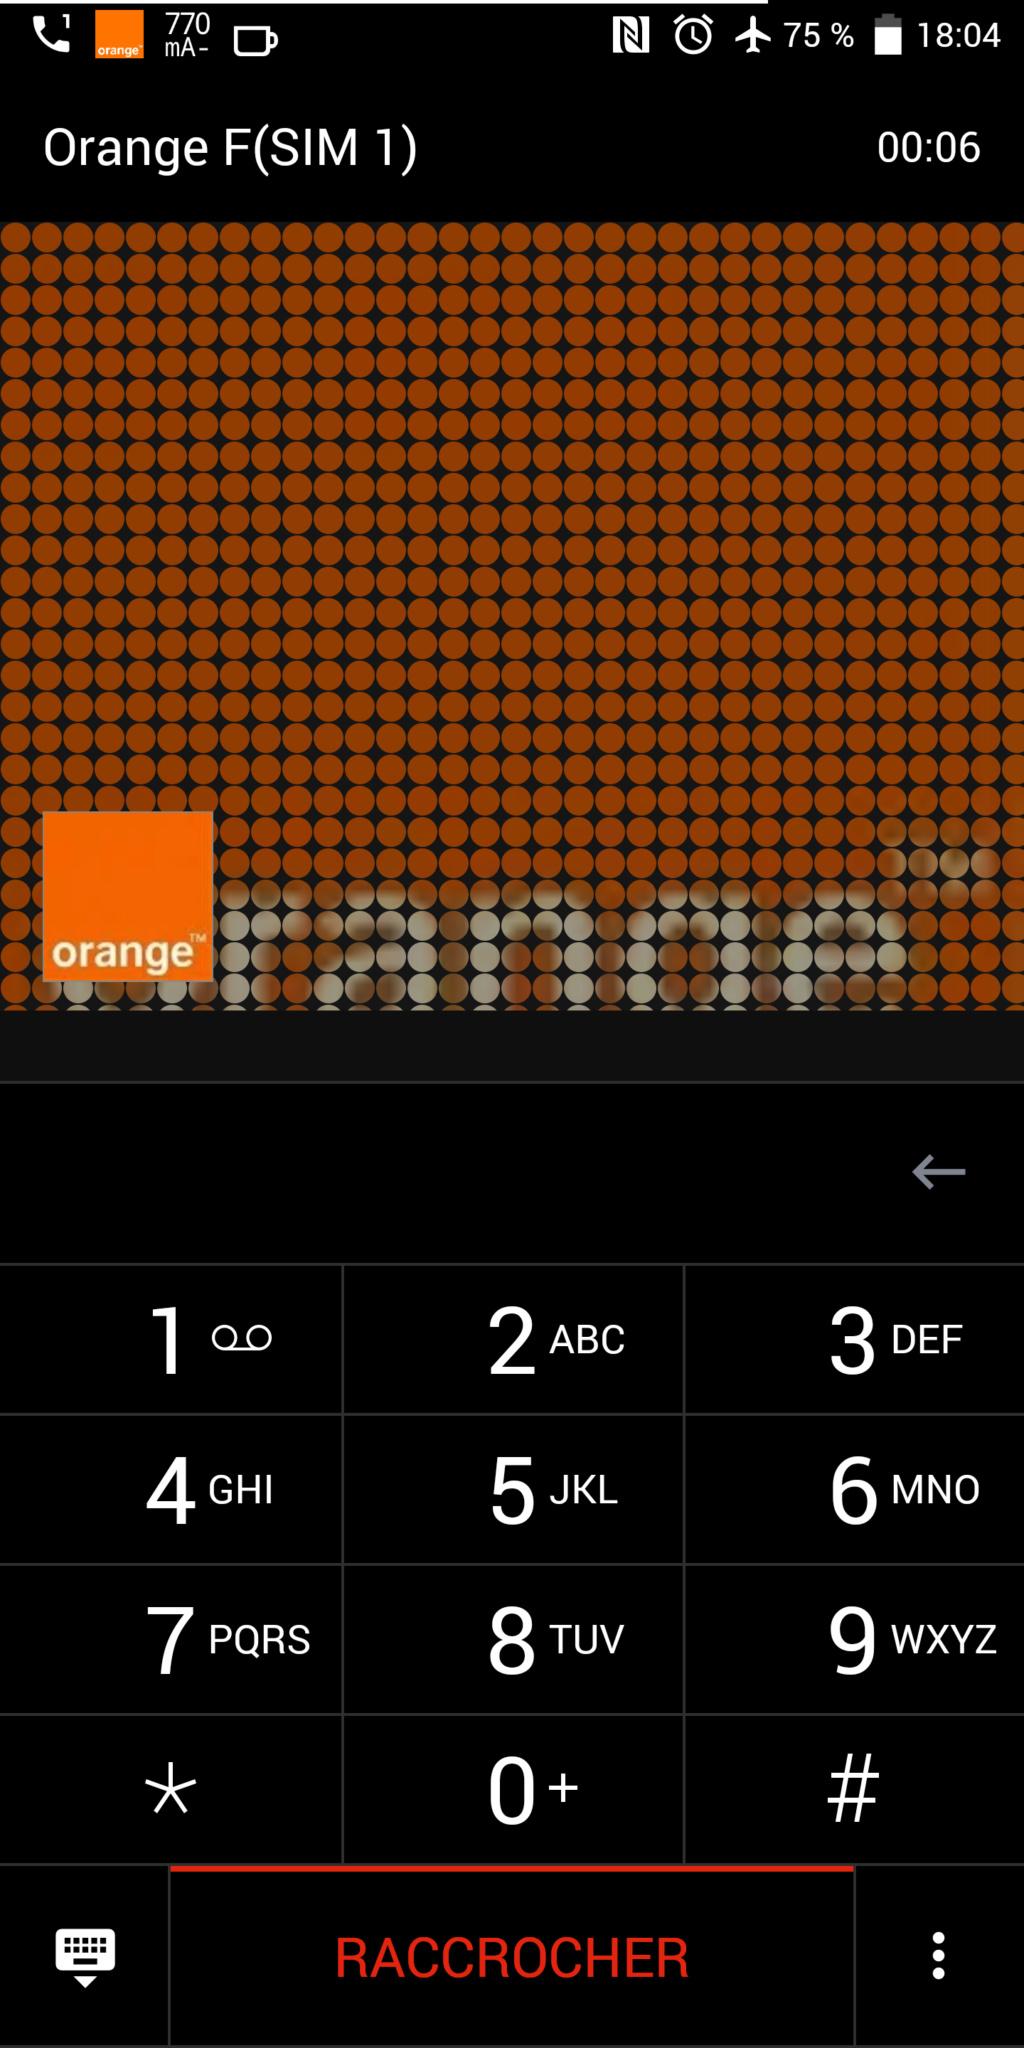 [AIDE] Bootloop interminable sur HTC U12+ - Page 3 Screen10